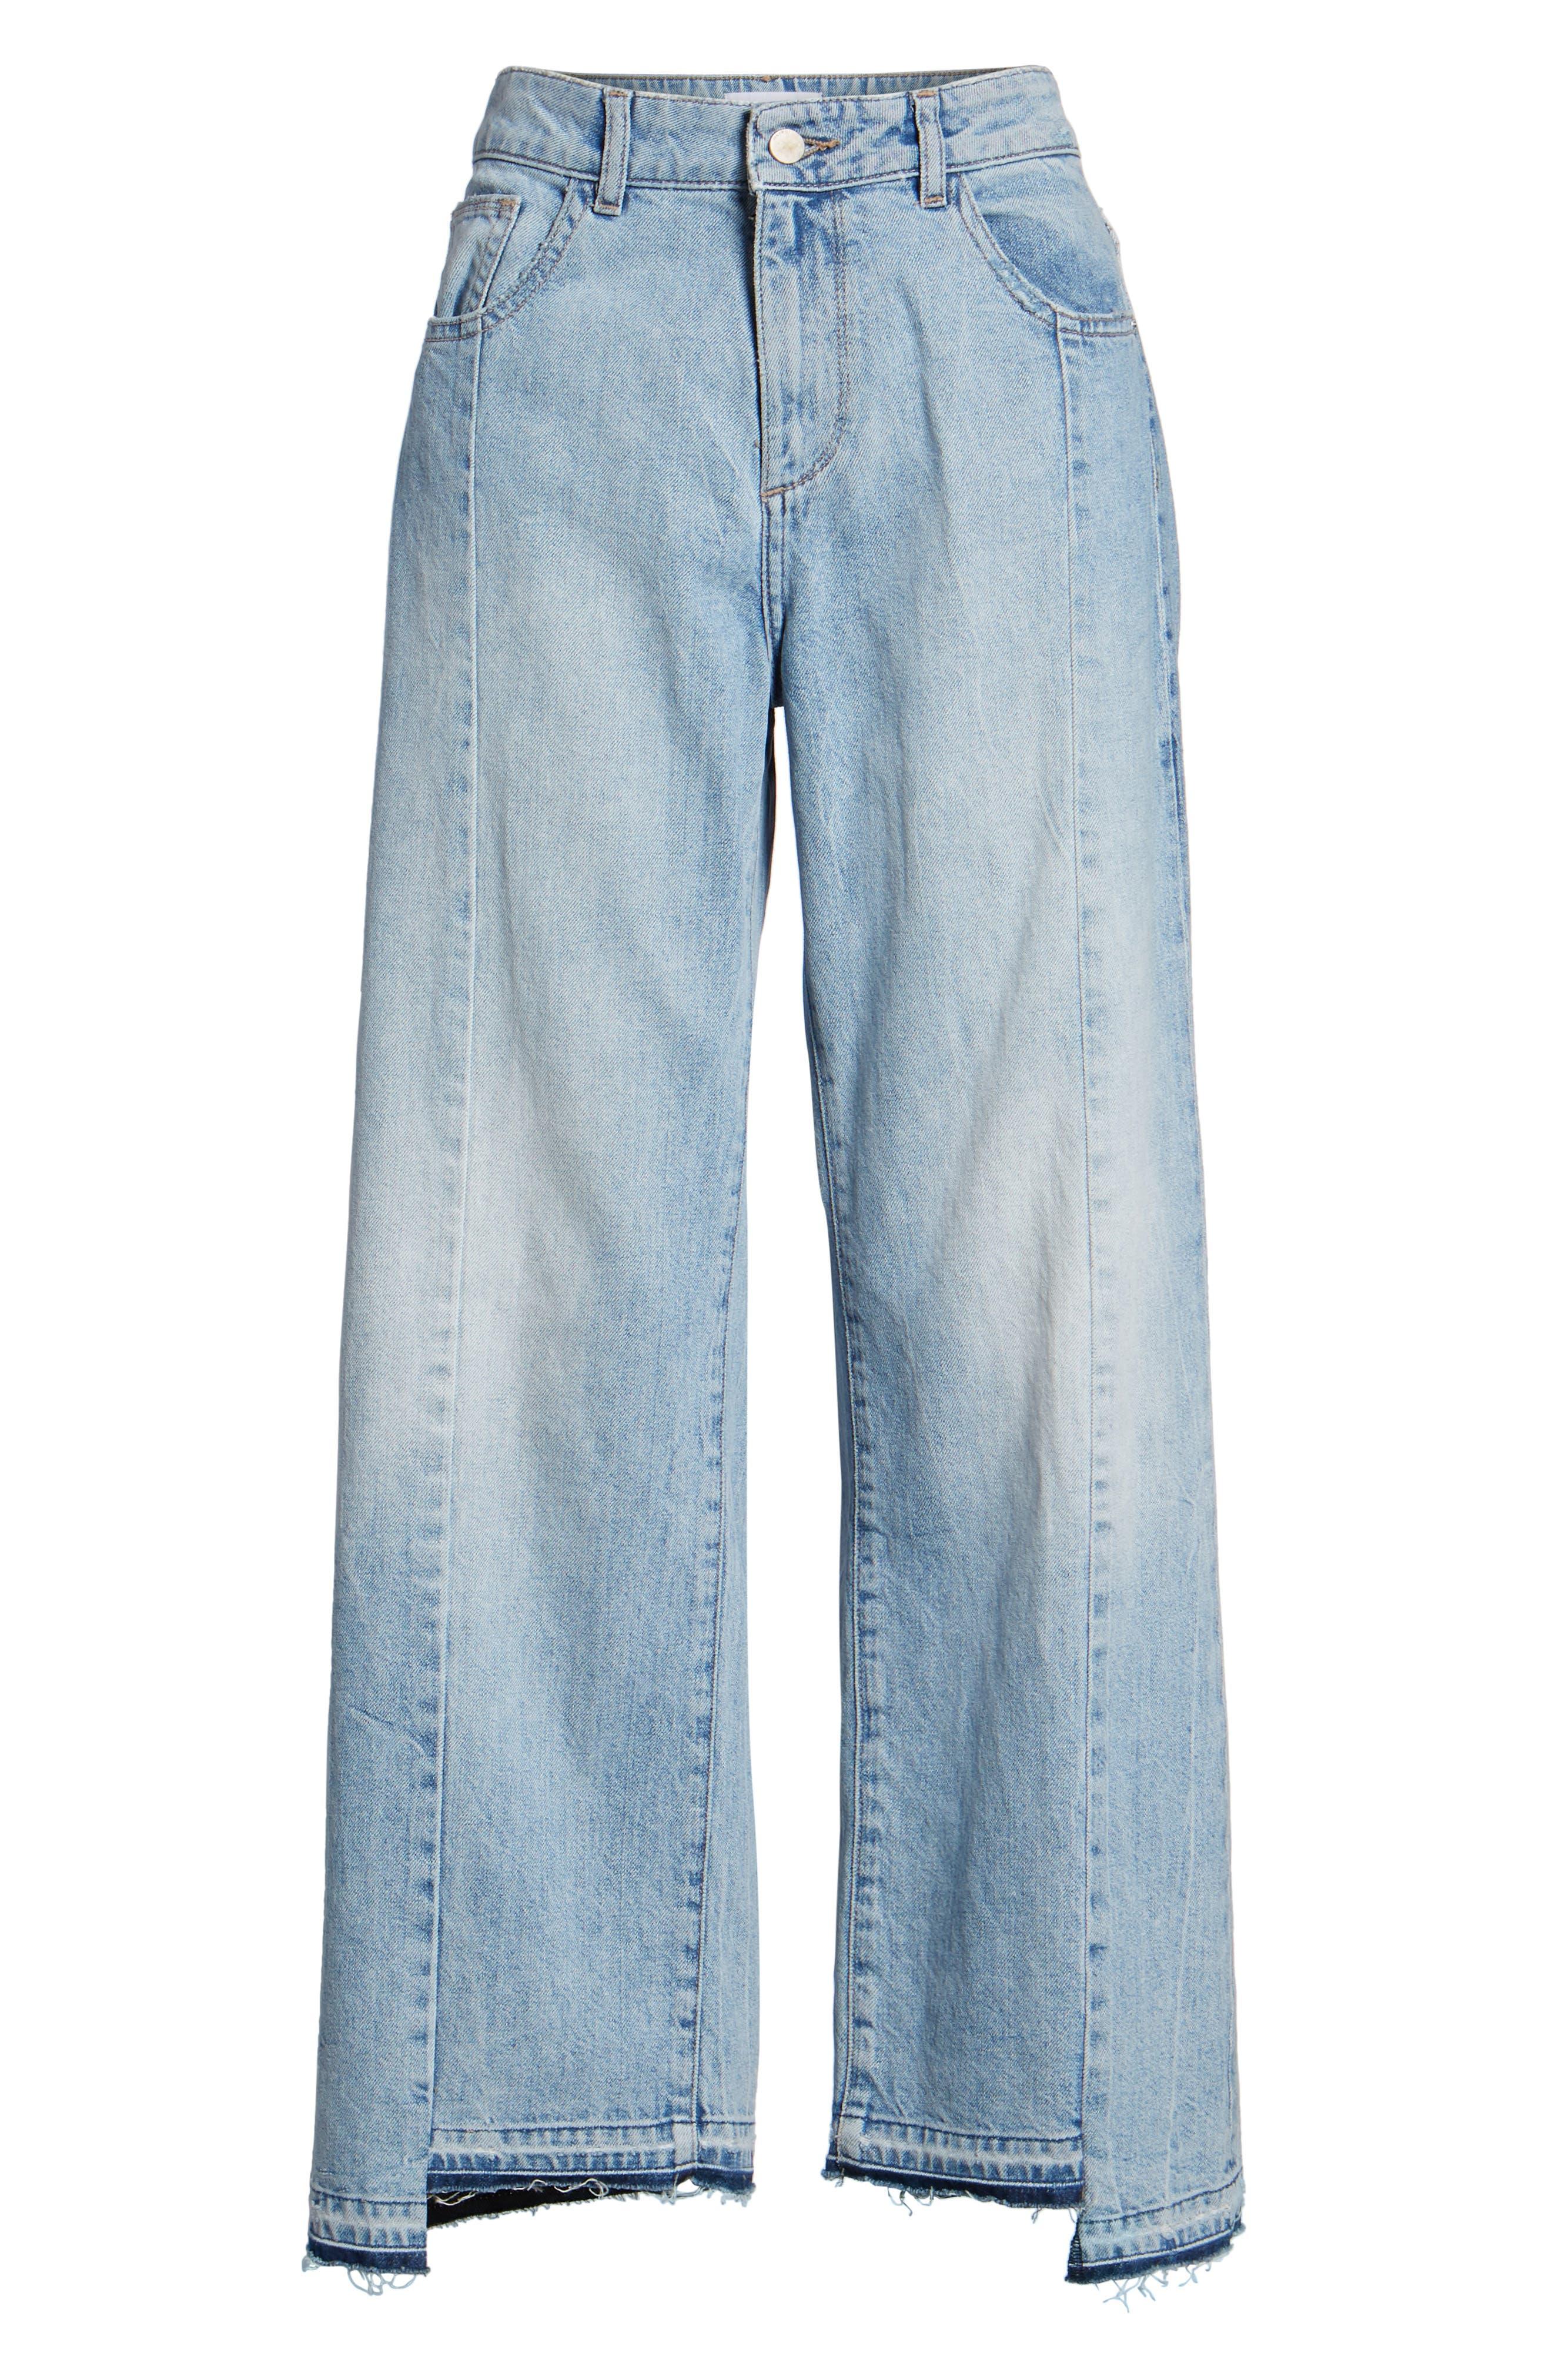 Hepburn High Waist Wide Leg Jeans,                             Alternate thumbnail 7, color,                             428